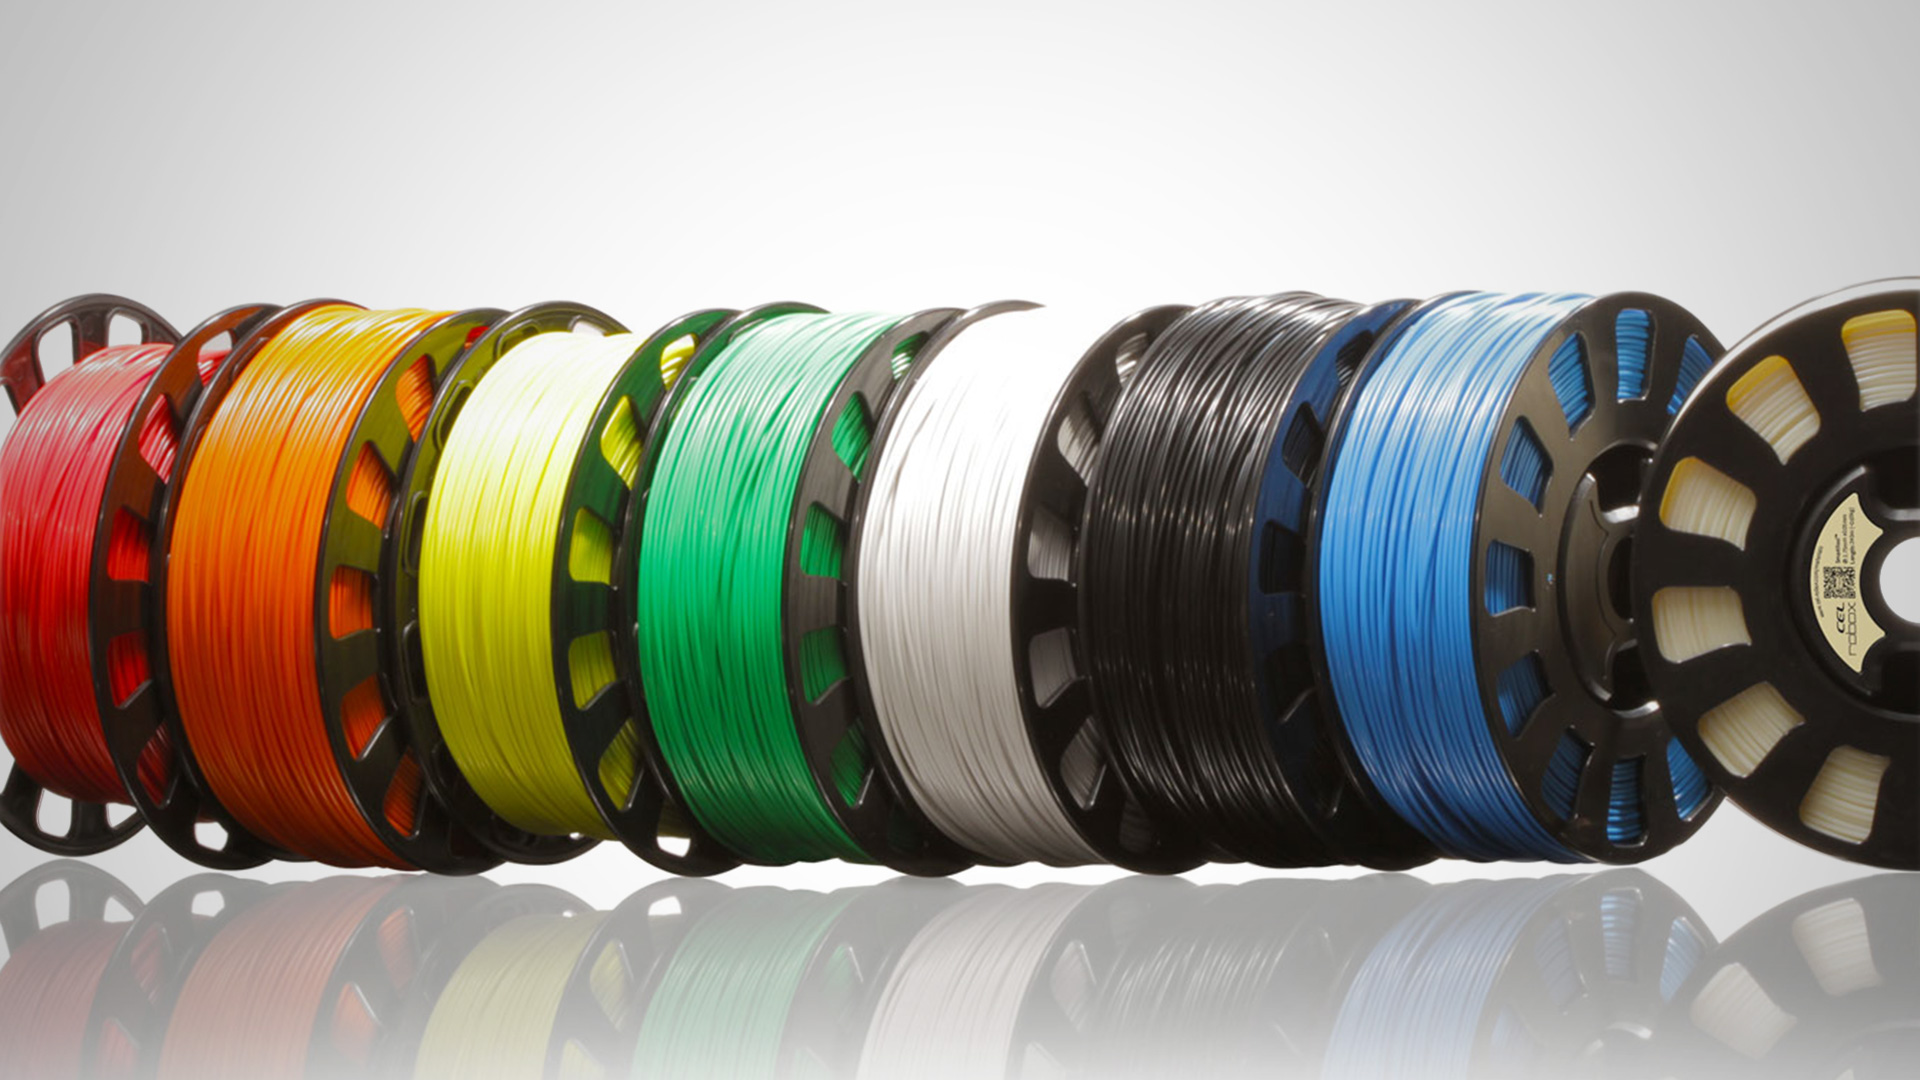 Die beliebtesten 3D-Drucker-Filament-Arten | All3DP